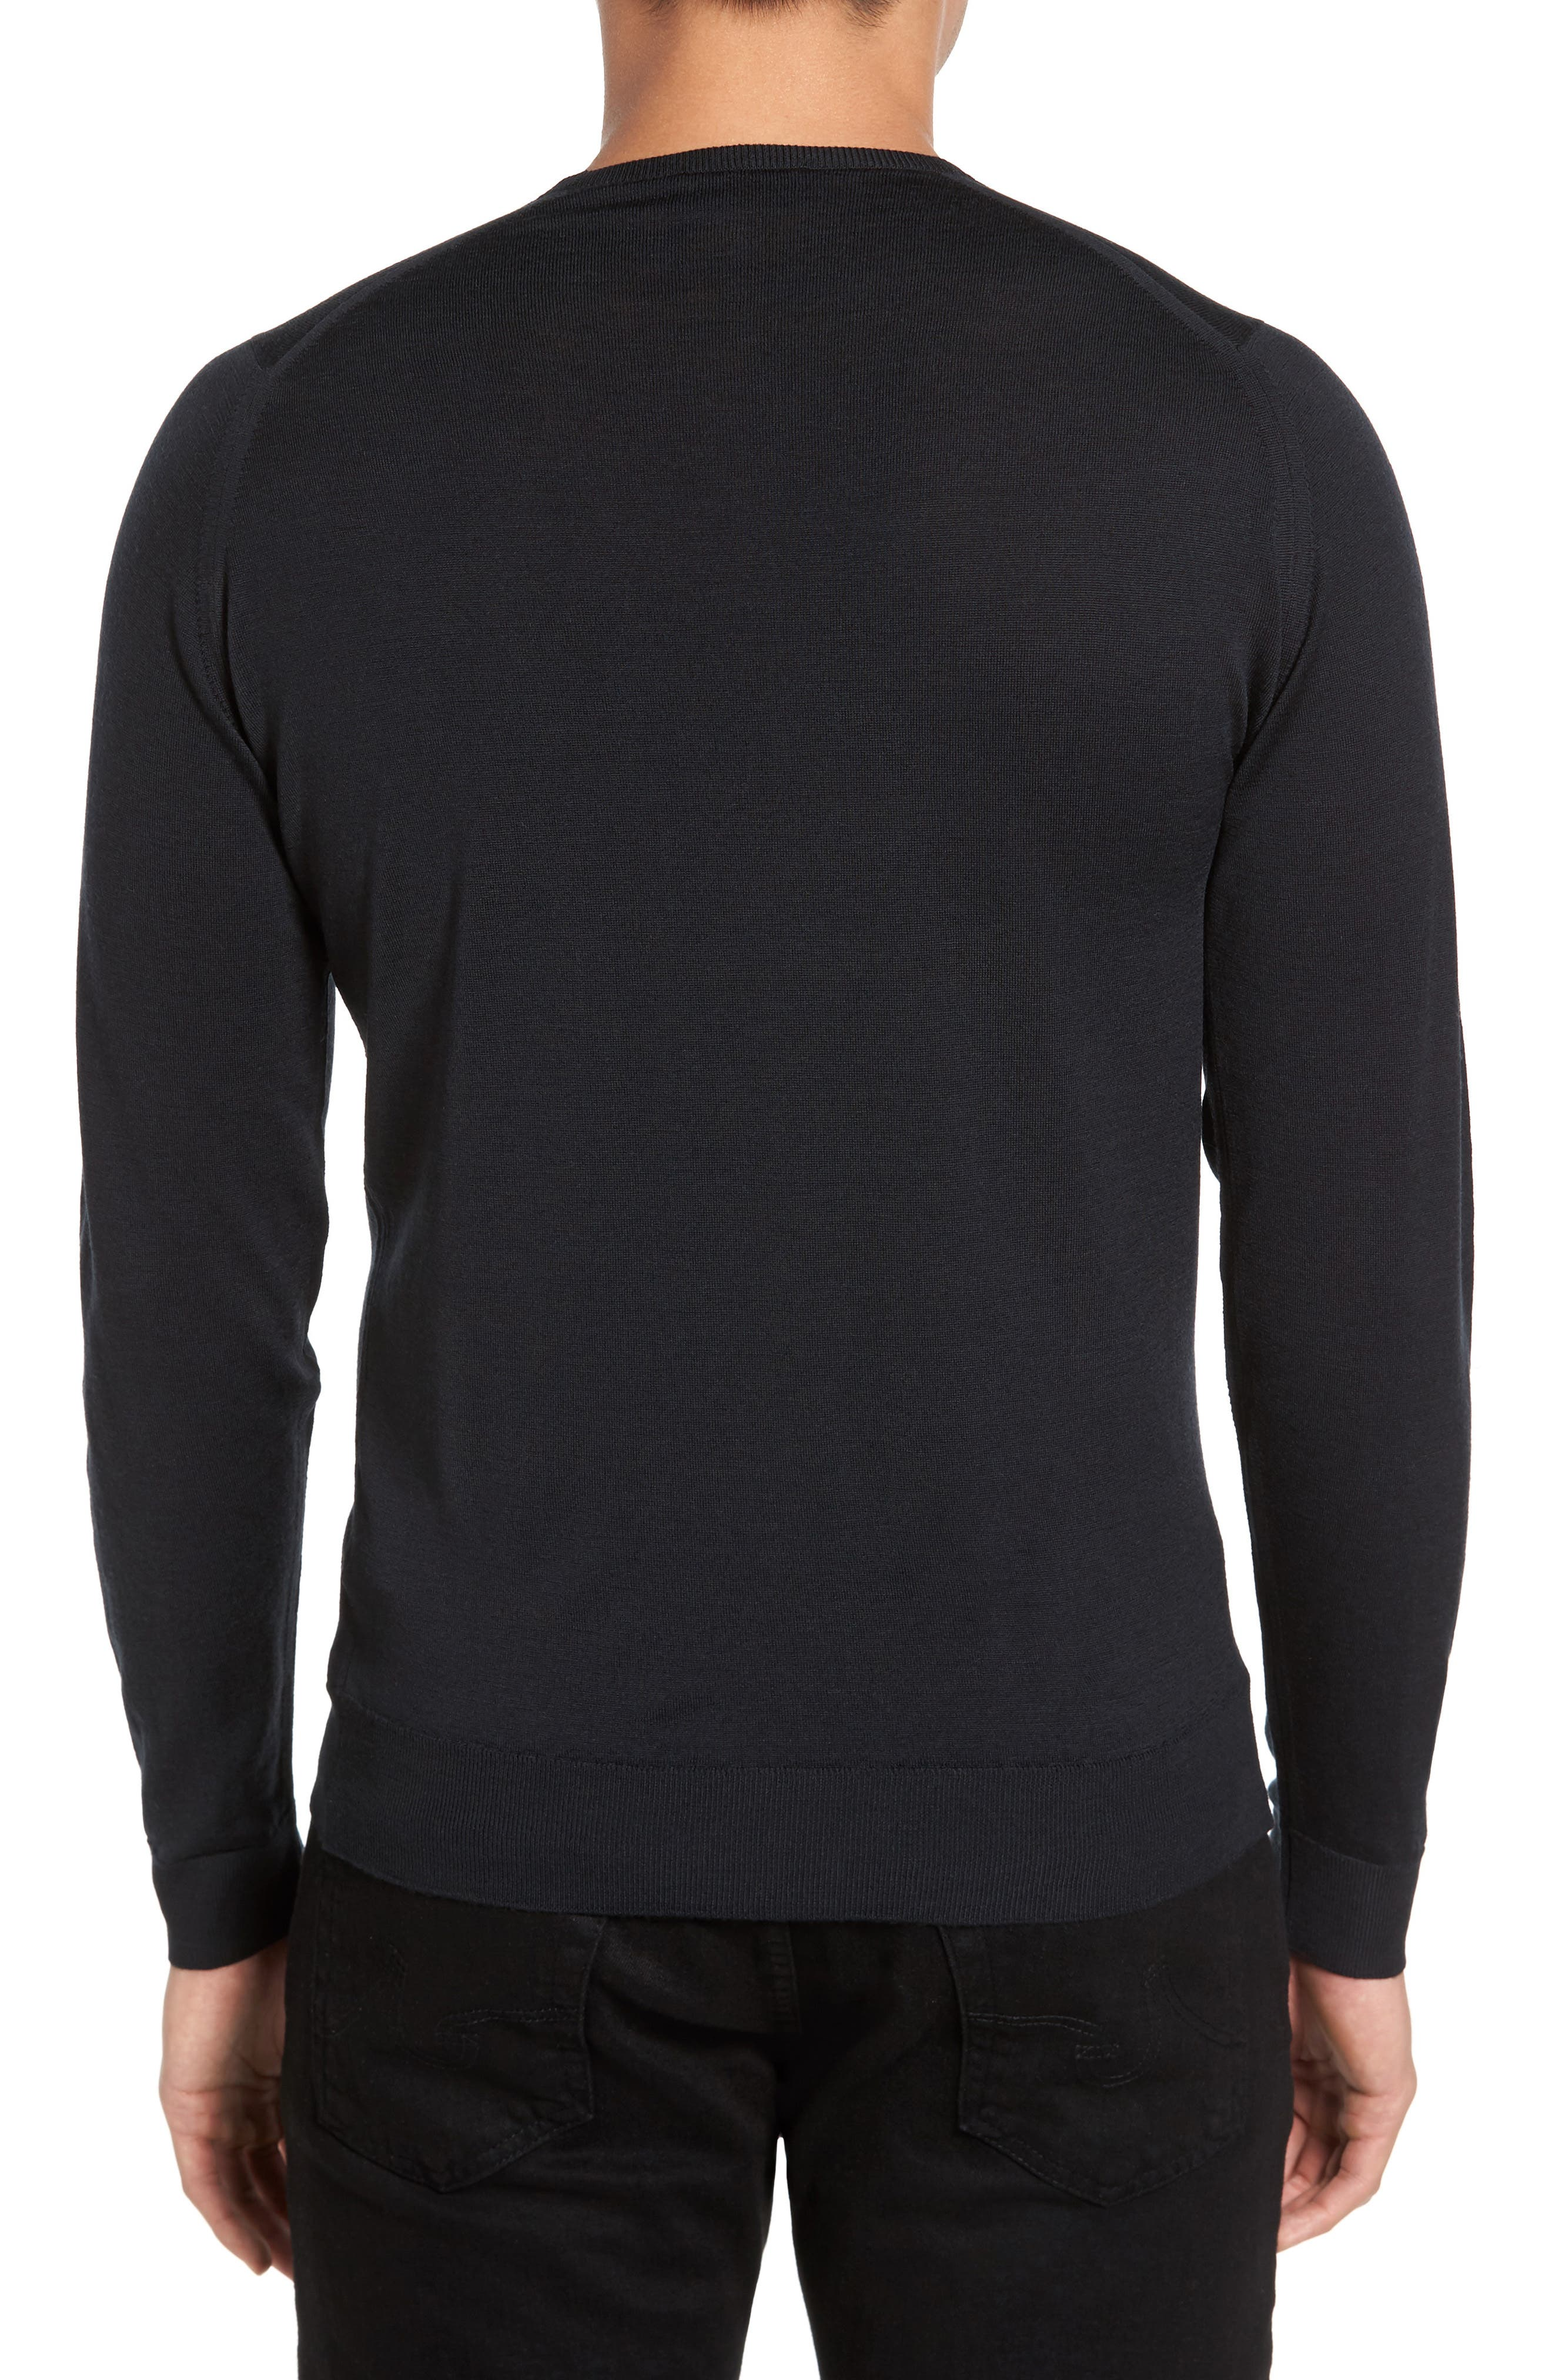 Merino Wool Sweater,                             Alternate thumbnail 2, color,                             001